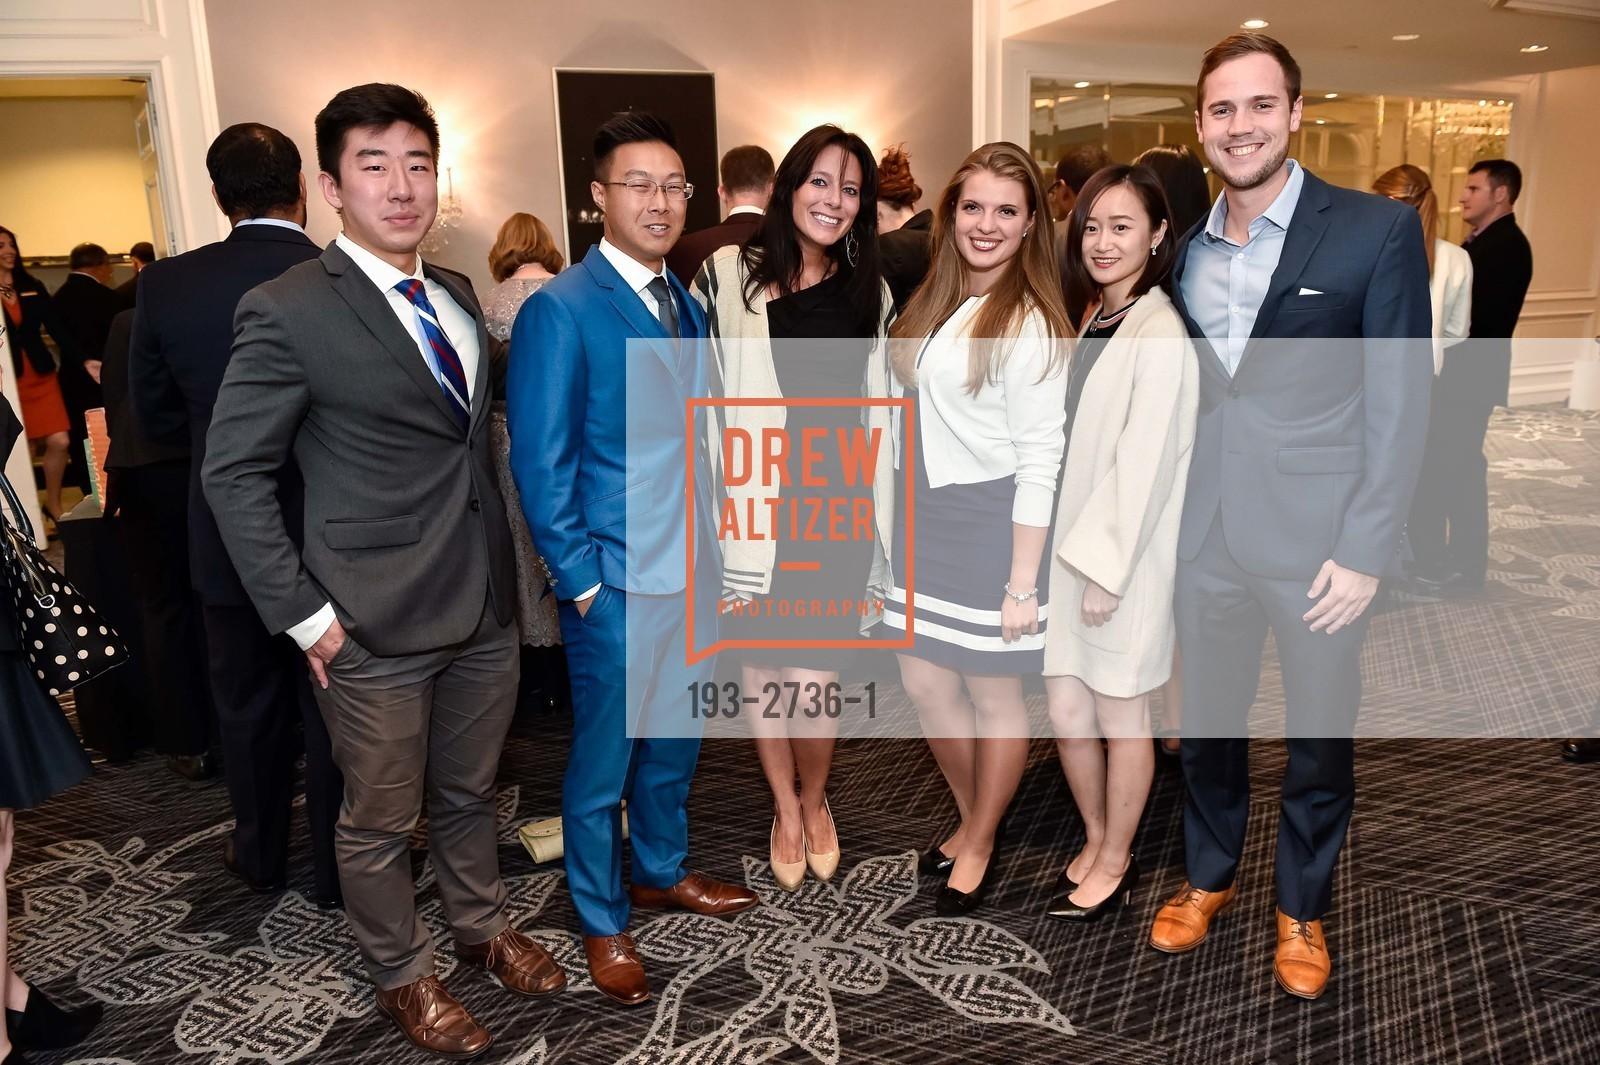 Lawrence Dong, George Liaw, Jennifer Majtan, Ivanna Ivanitska, Eva Gao, Ken Golonka, Photo #193-2736-1